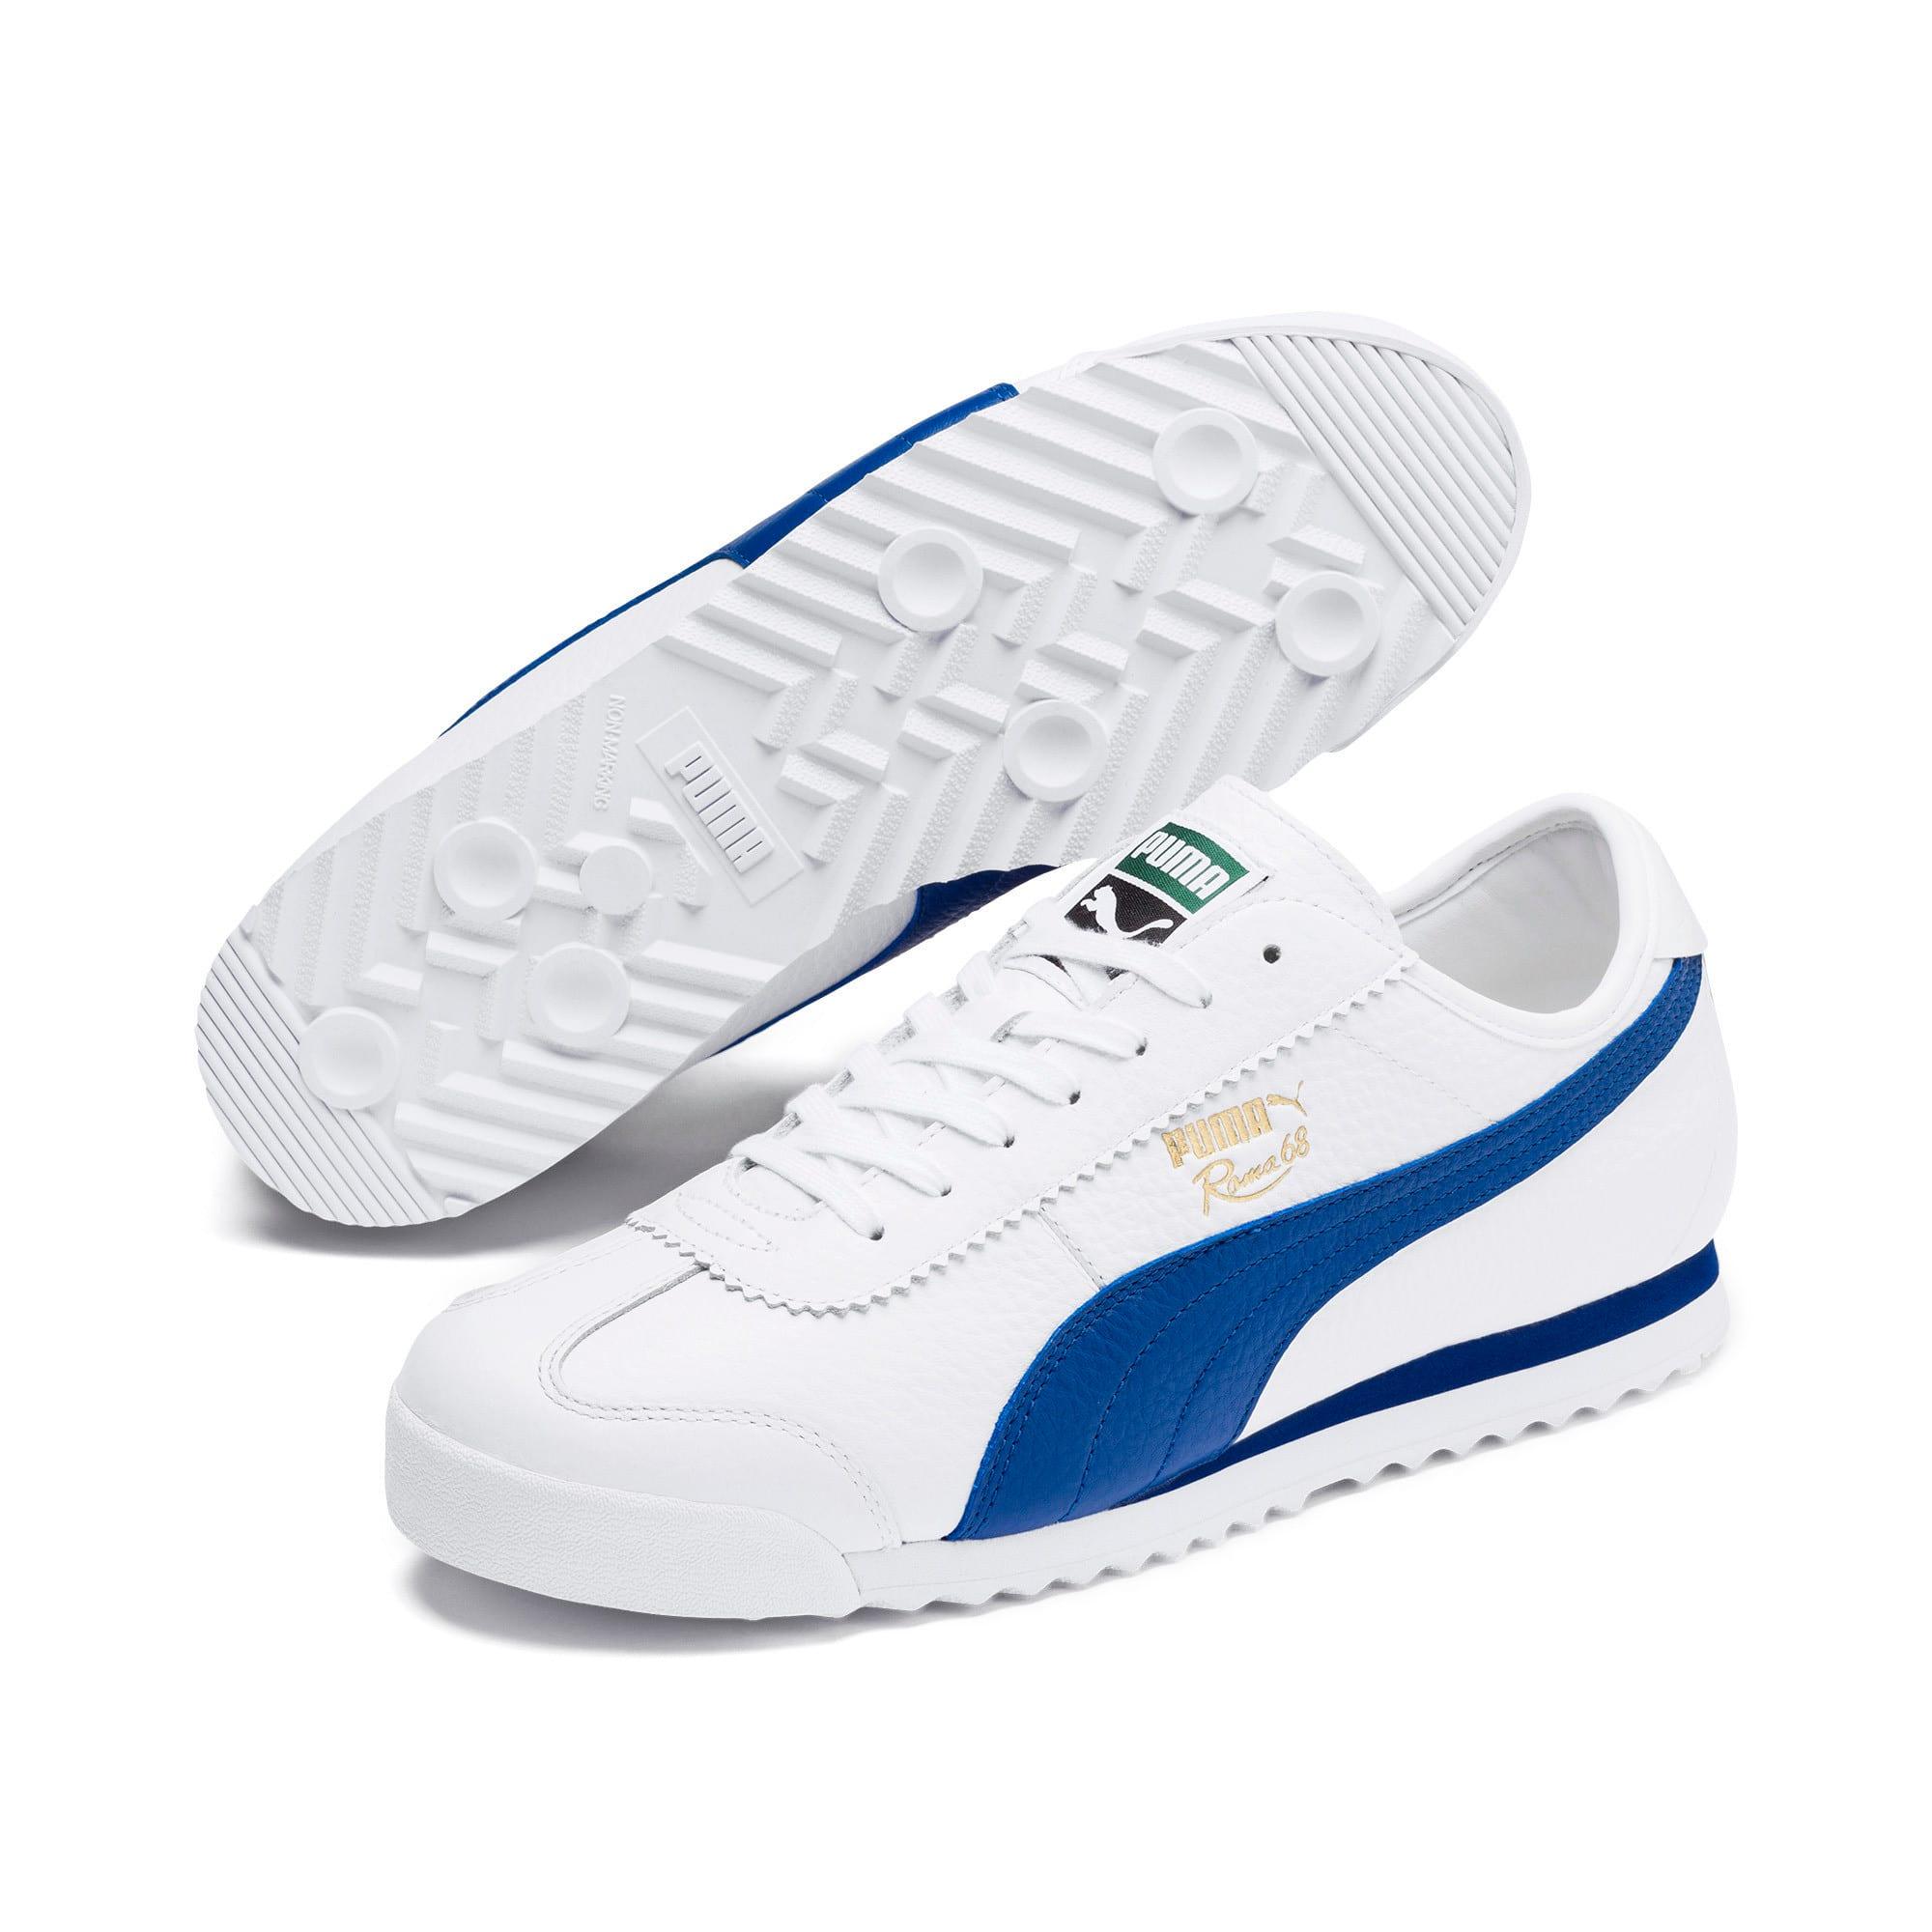 Miniatura 2 de Zapatos deportivos Roma '68 Vintage, Puma White-Galaxy Blue, mediano